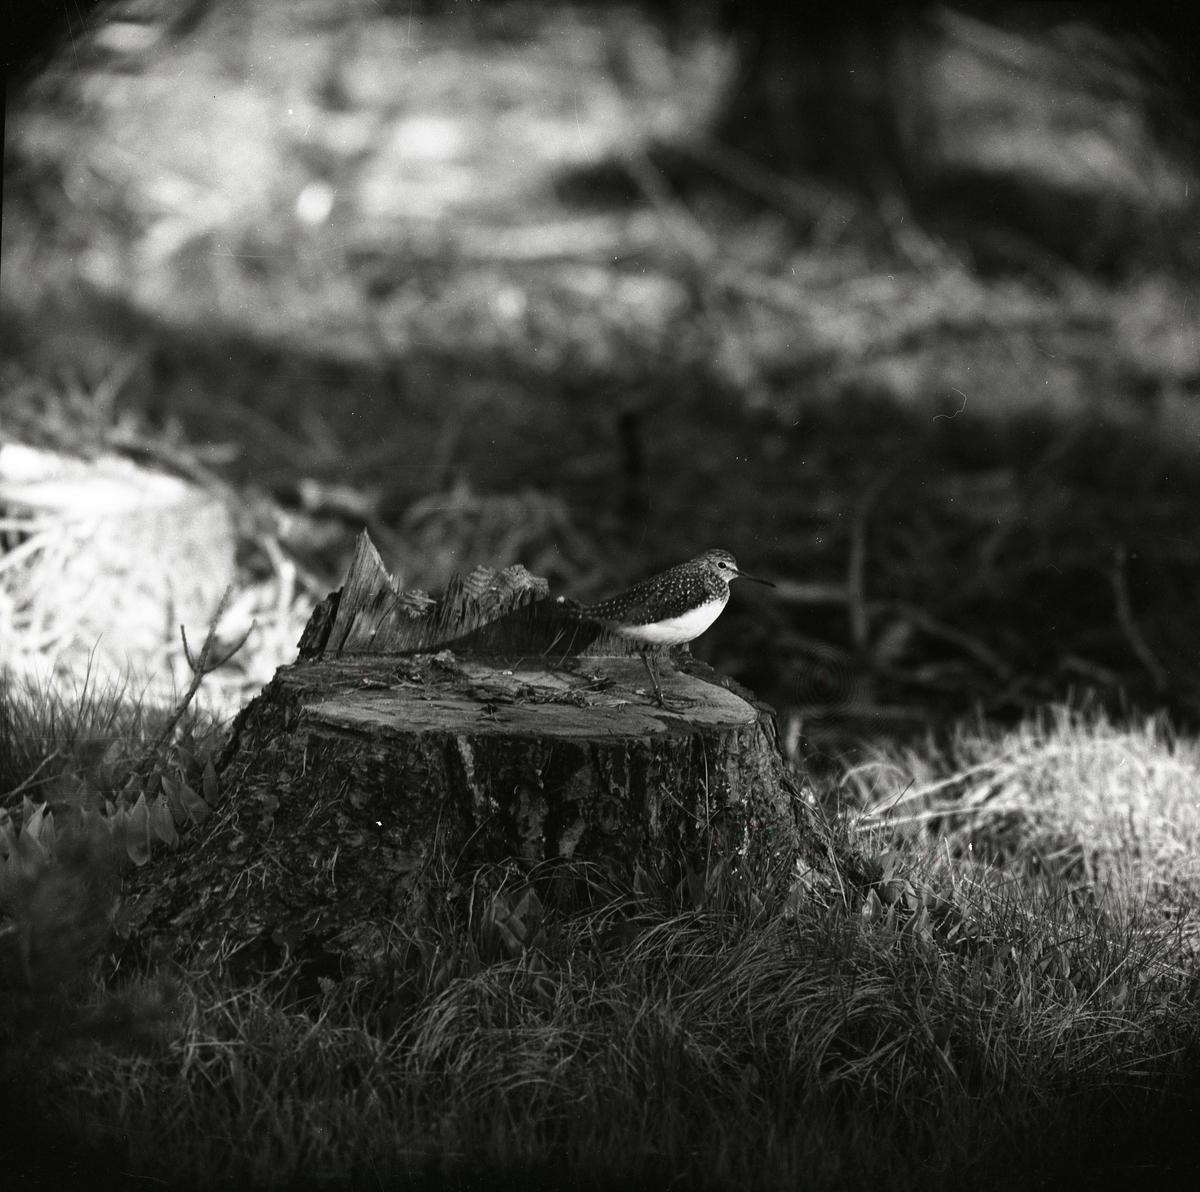 En grönbena sitter på en trädstubbe i Sanbacken, 24 maj 1959.